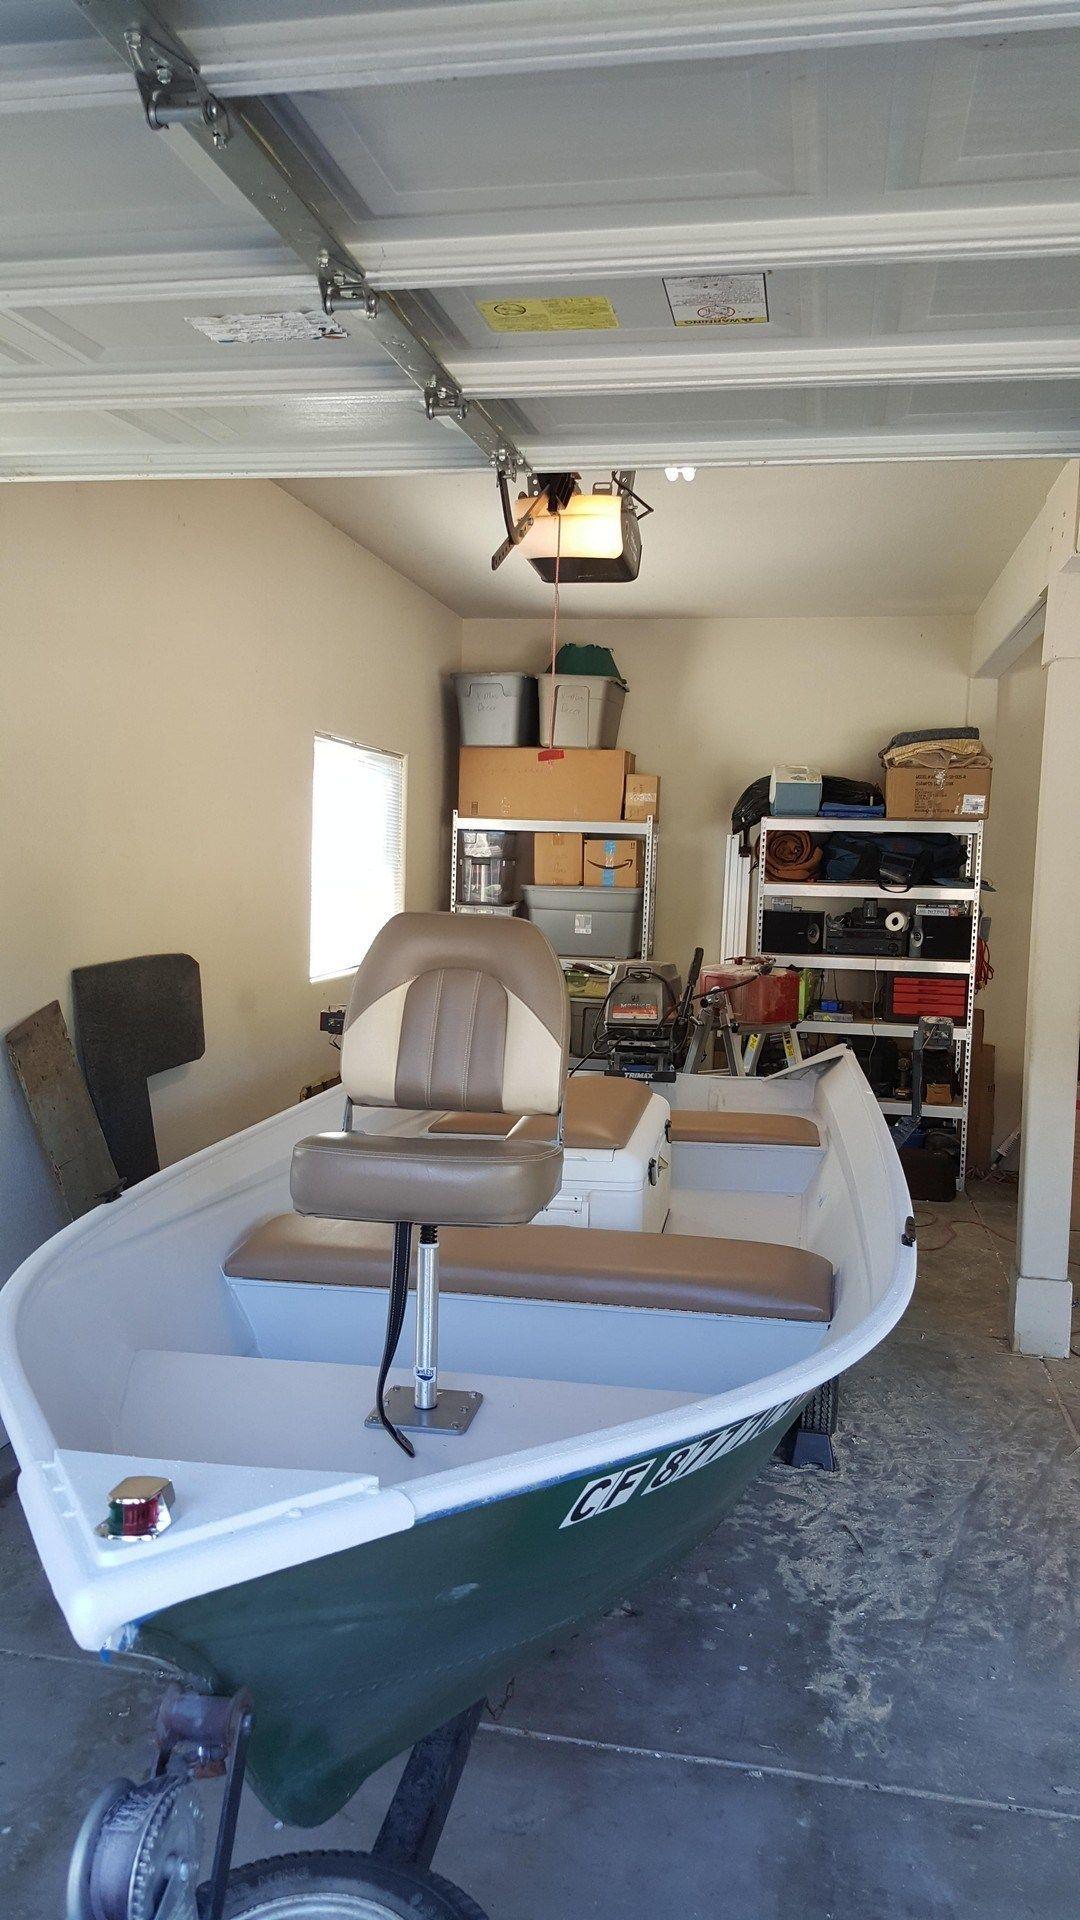 16 Aluminum Boat Fishing Conversation and Restoration | DYI